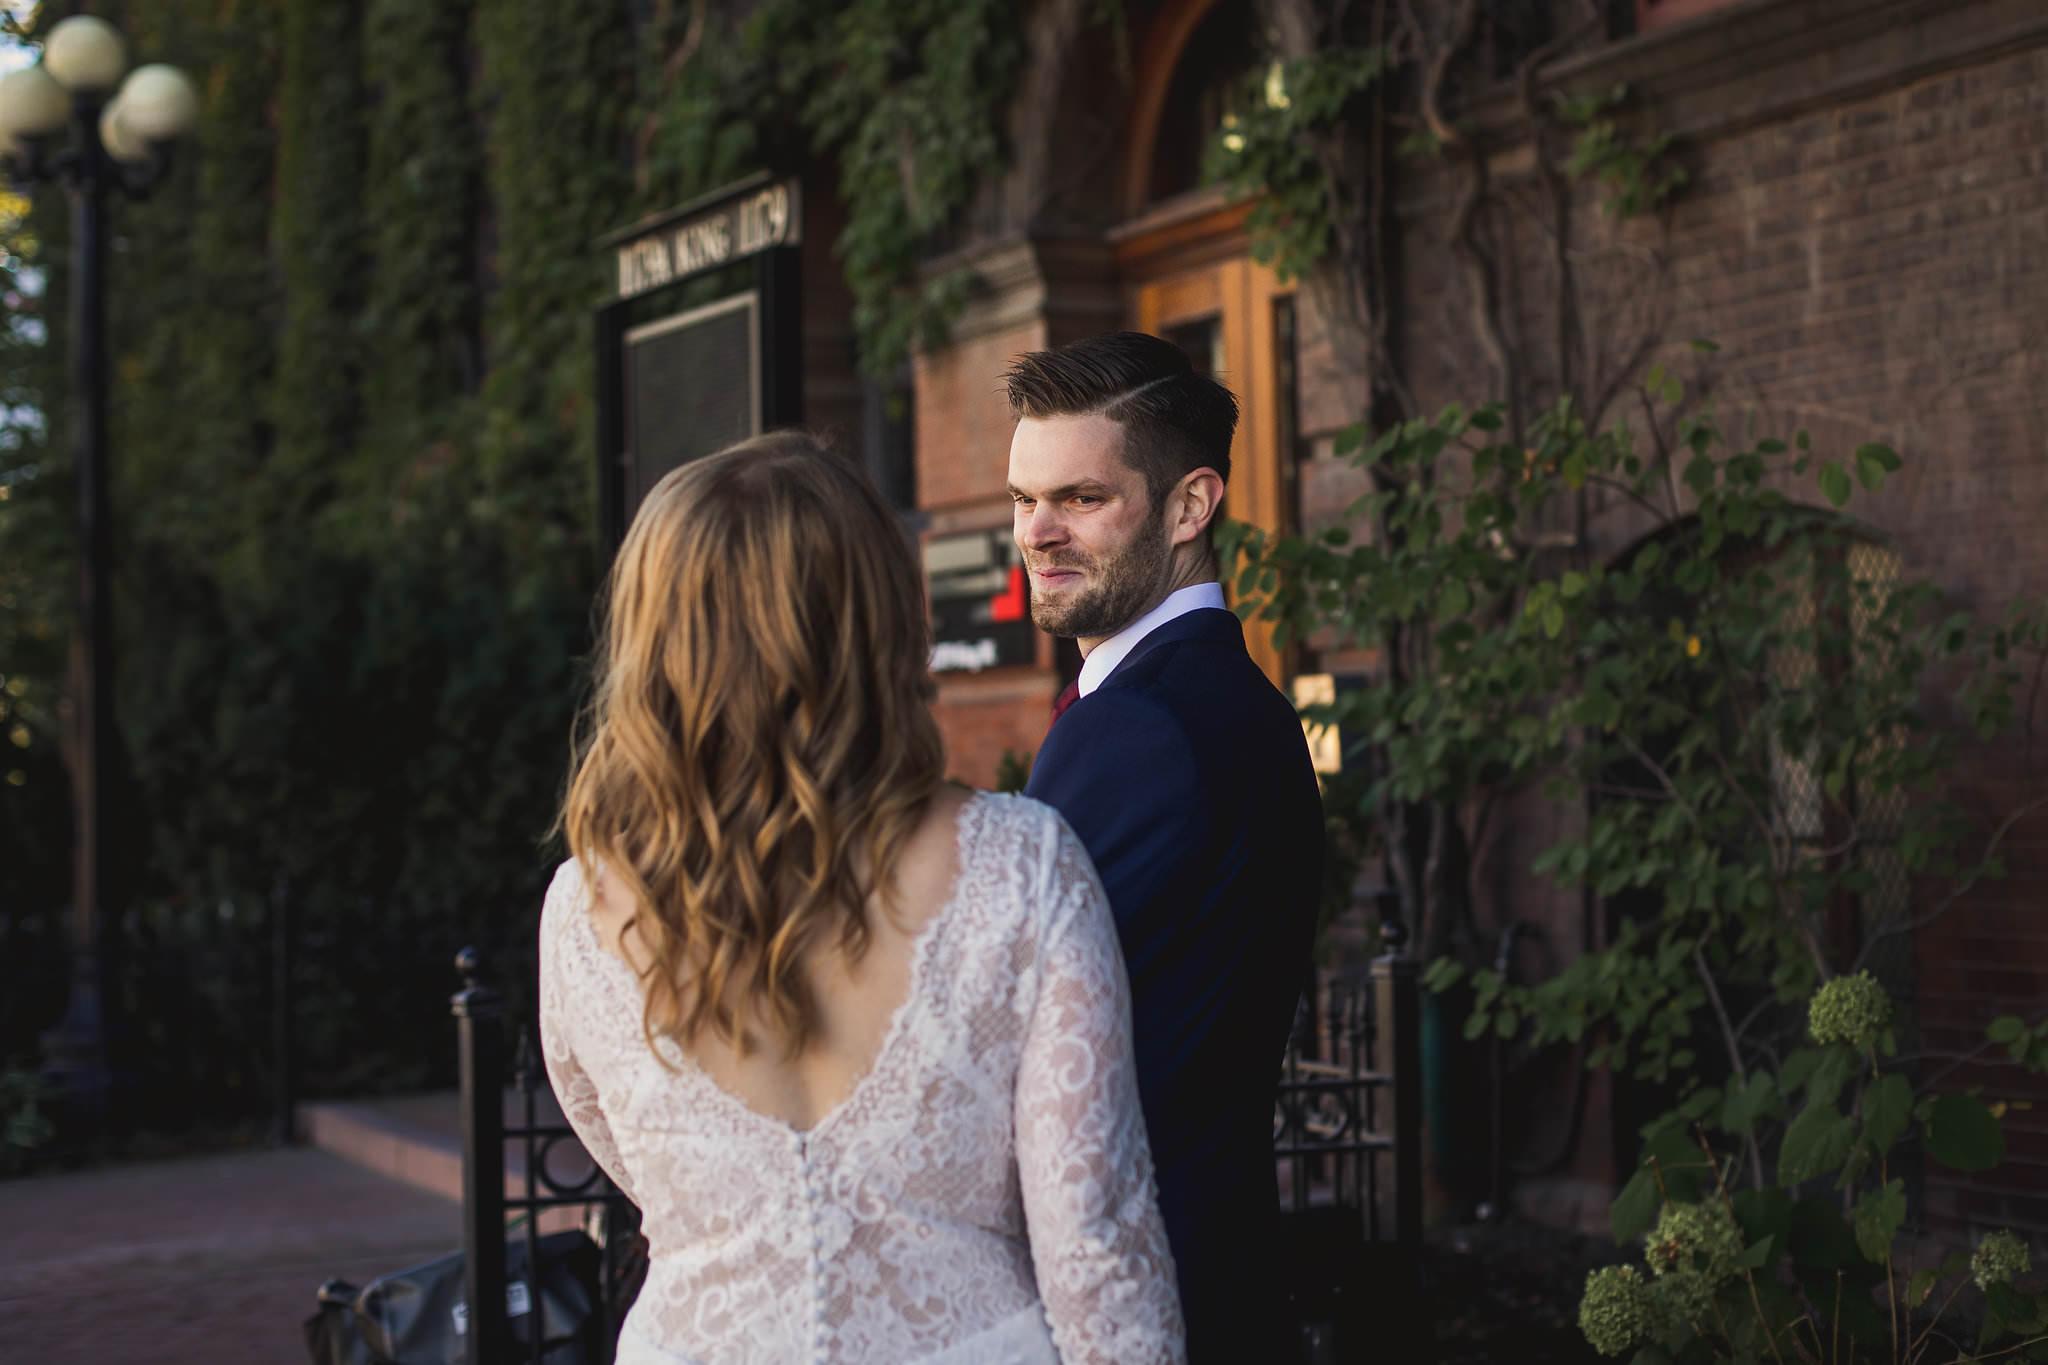 99 sudbury wedding cost